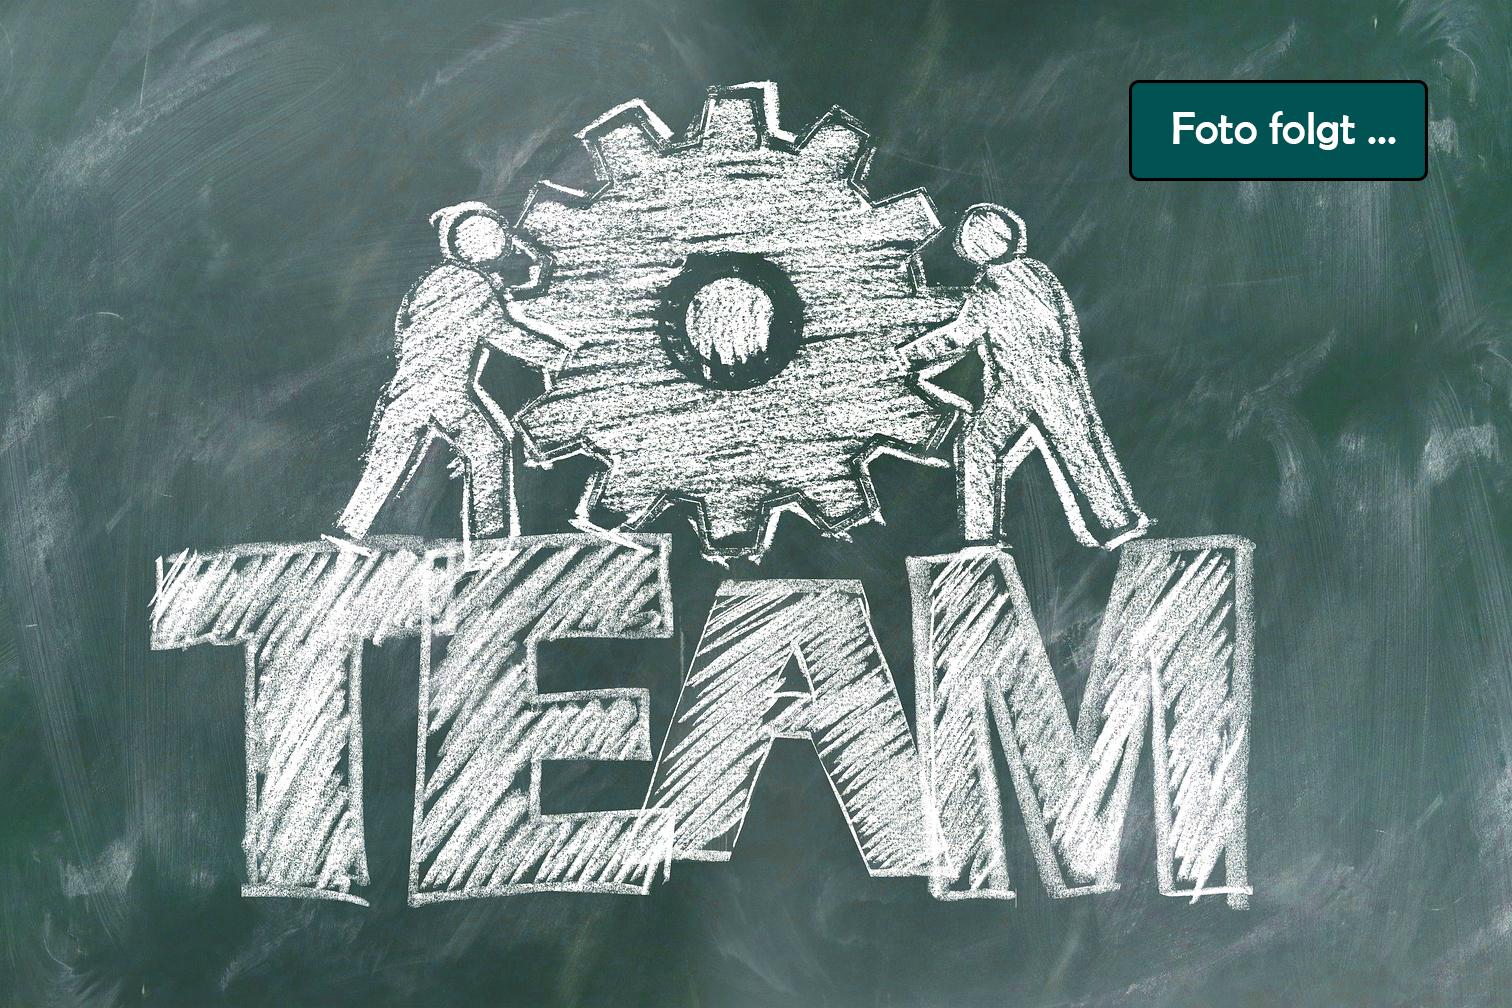 teamwork - Foto folgt